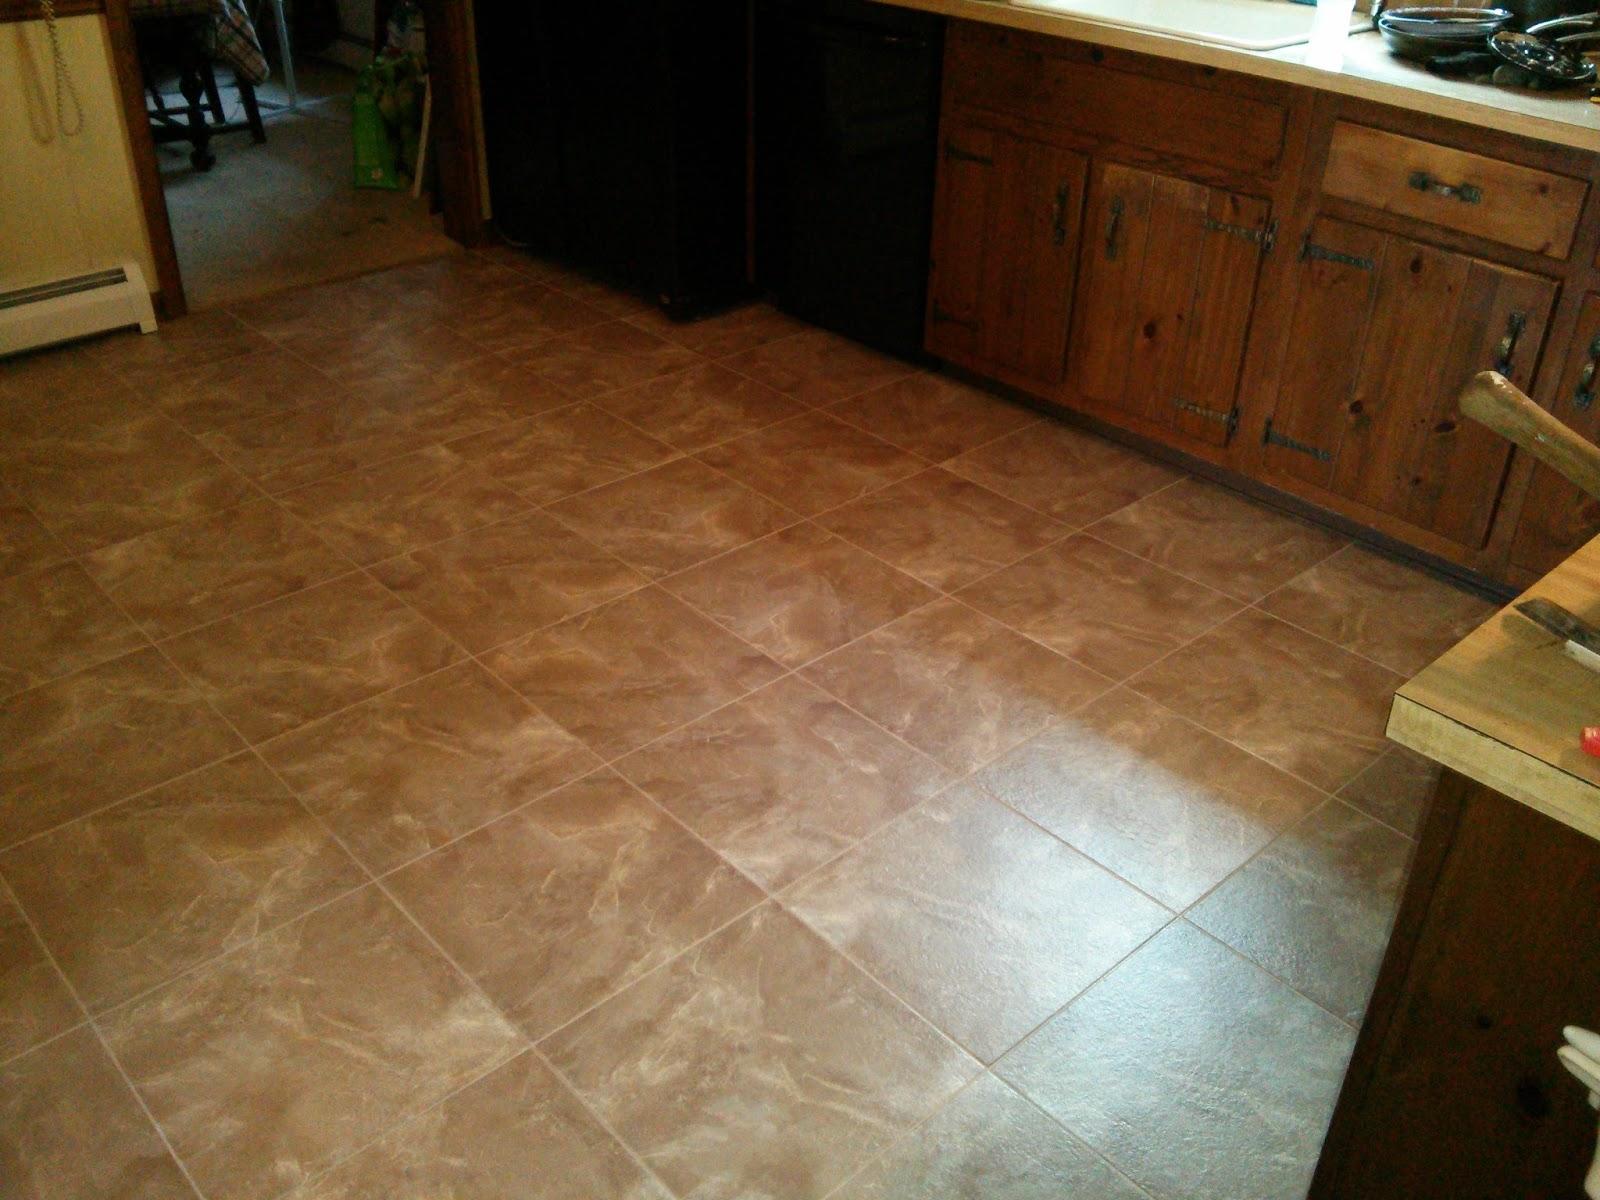 Congoleum Duraceramic Flooring Reviews - Carpet Vidalondon